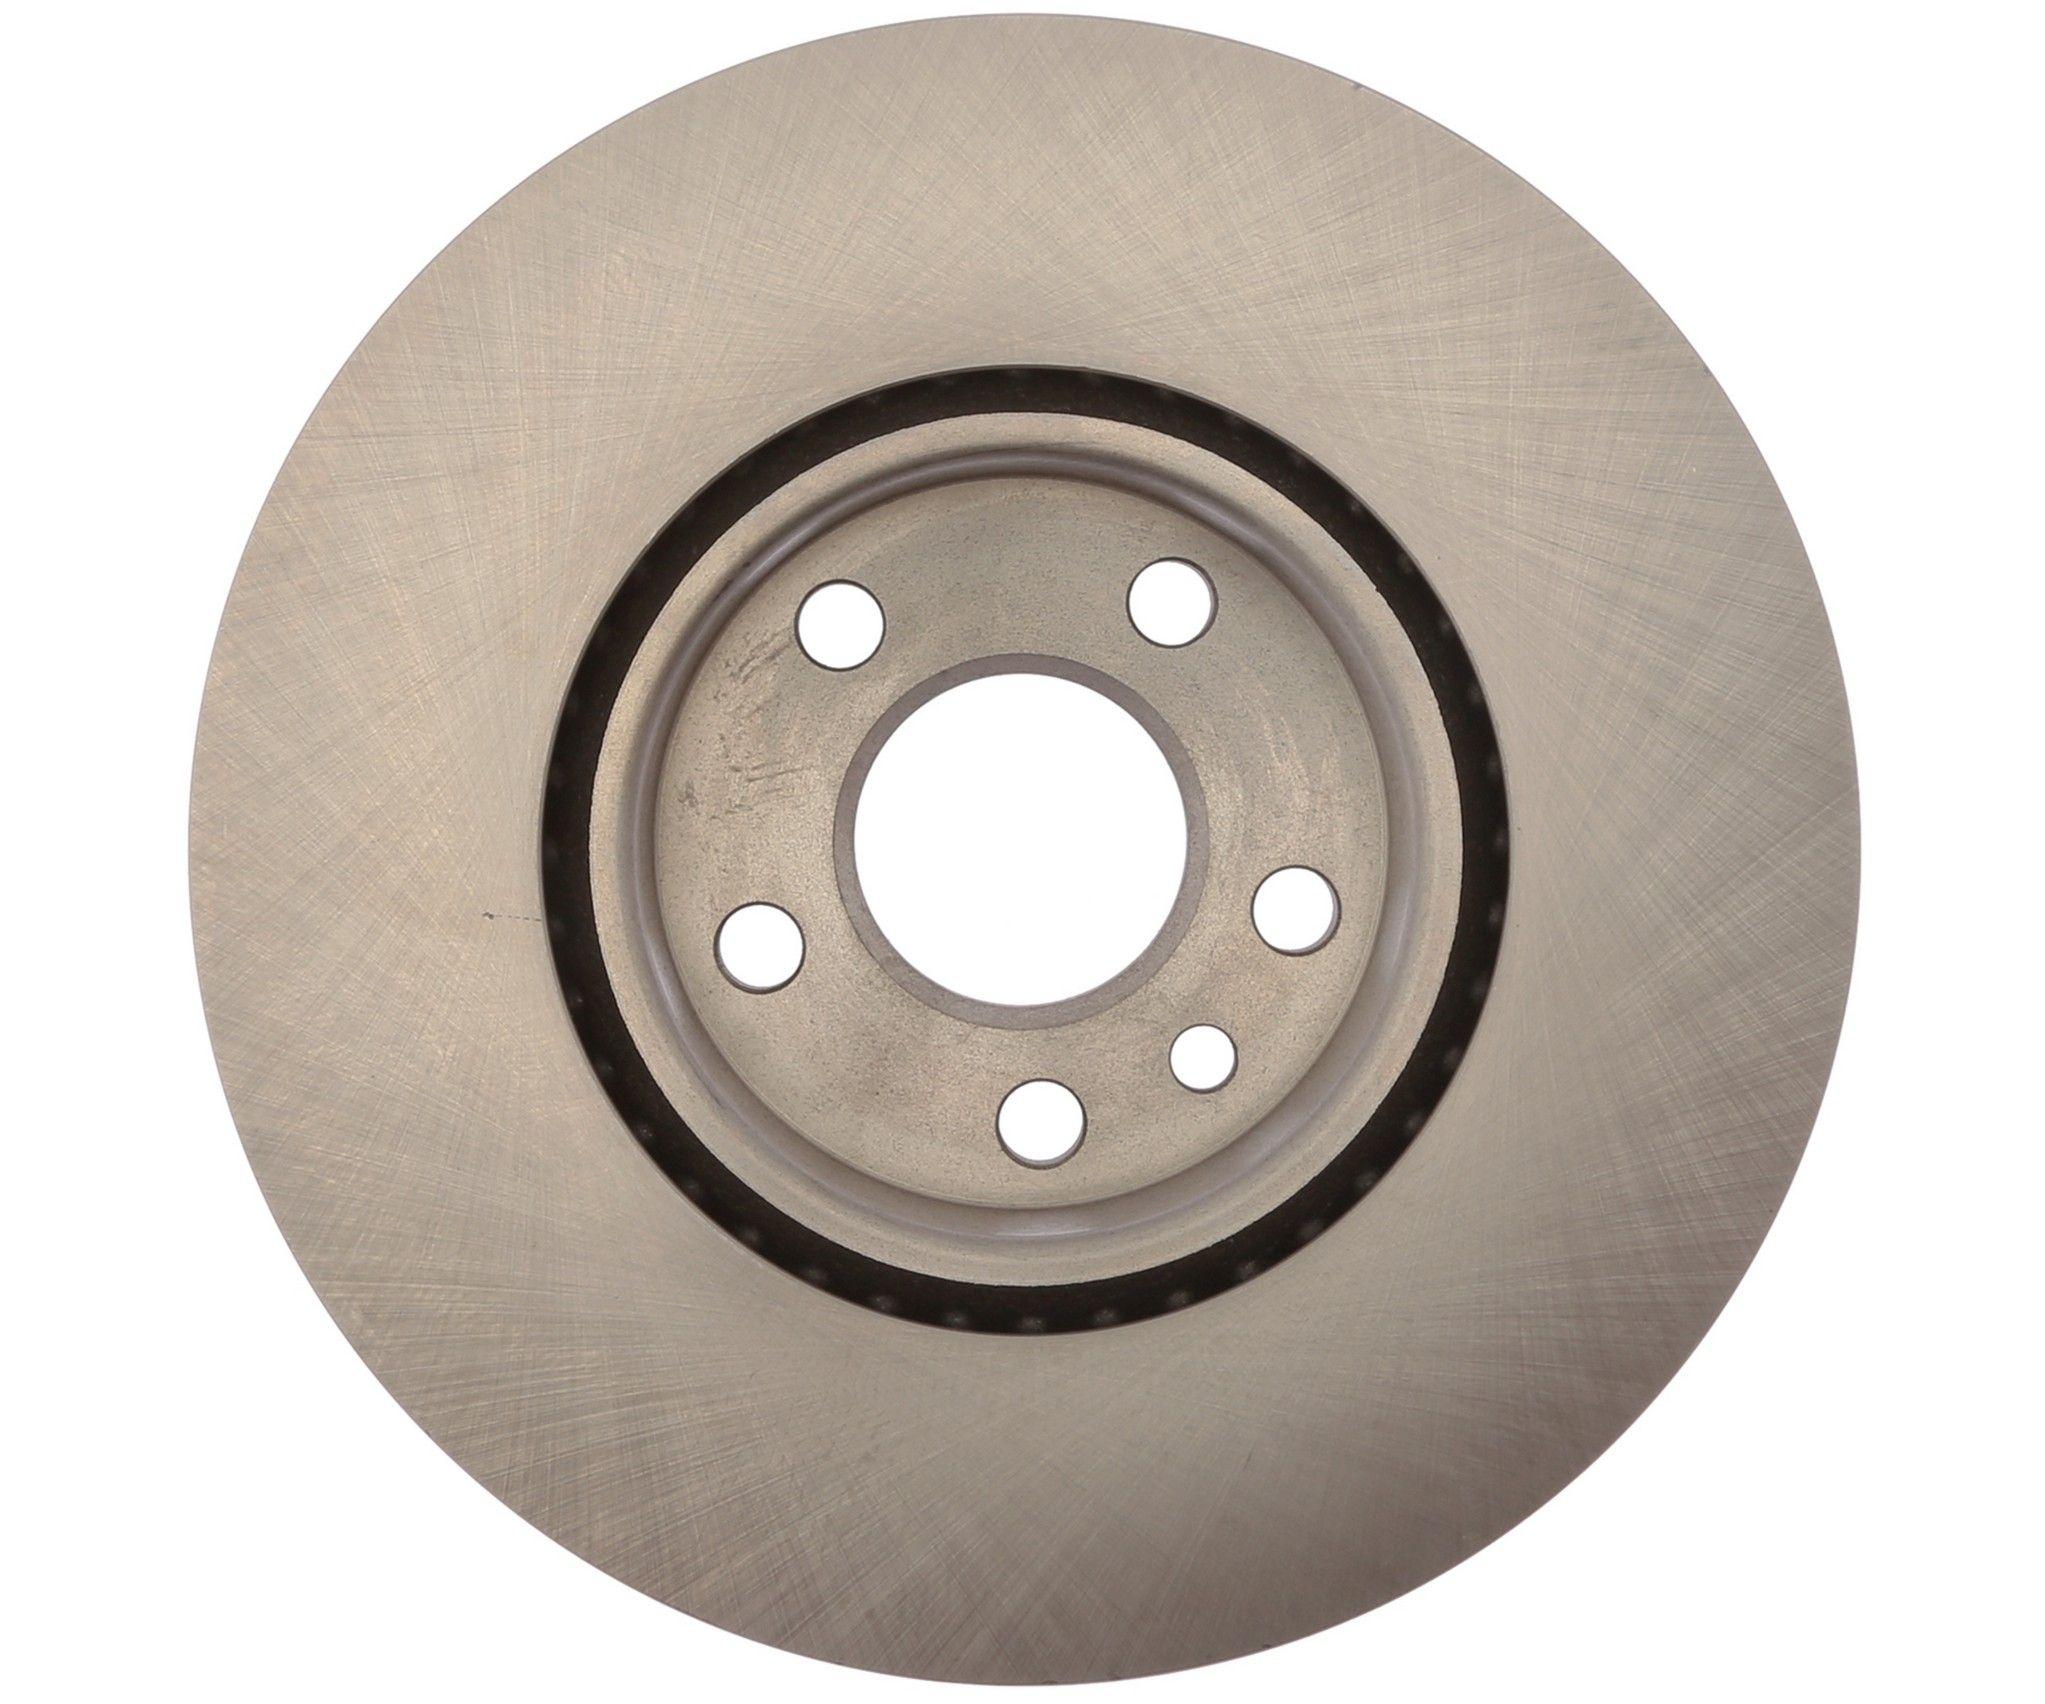 Set of 2 Brembo 08.7765.11 Rear UV Coated Brake Disc